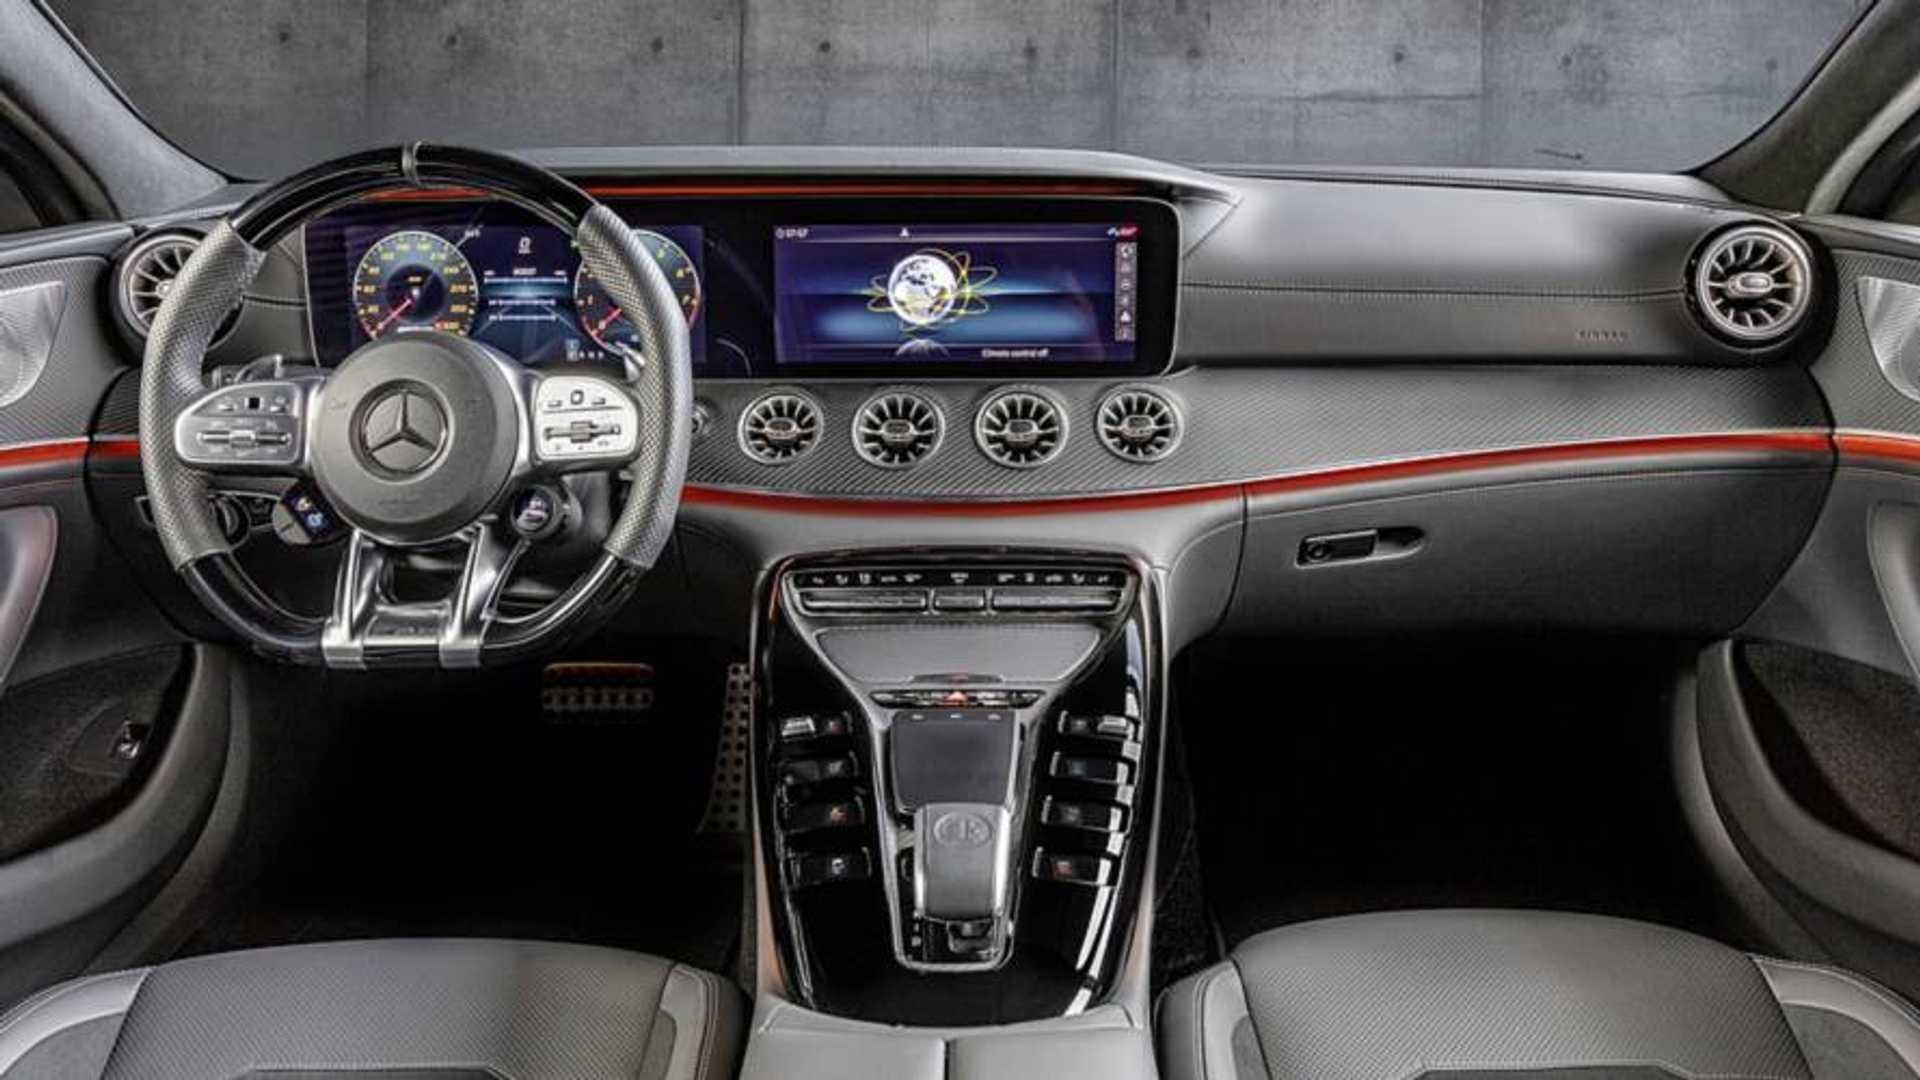 2019-mercedes-amg-gt-43-four-door-coupe